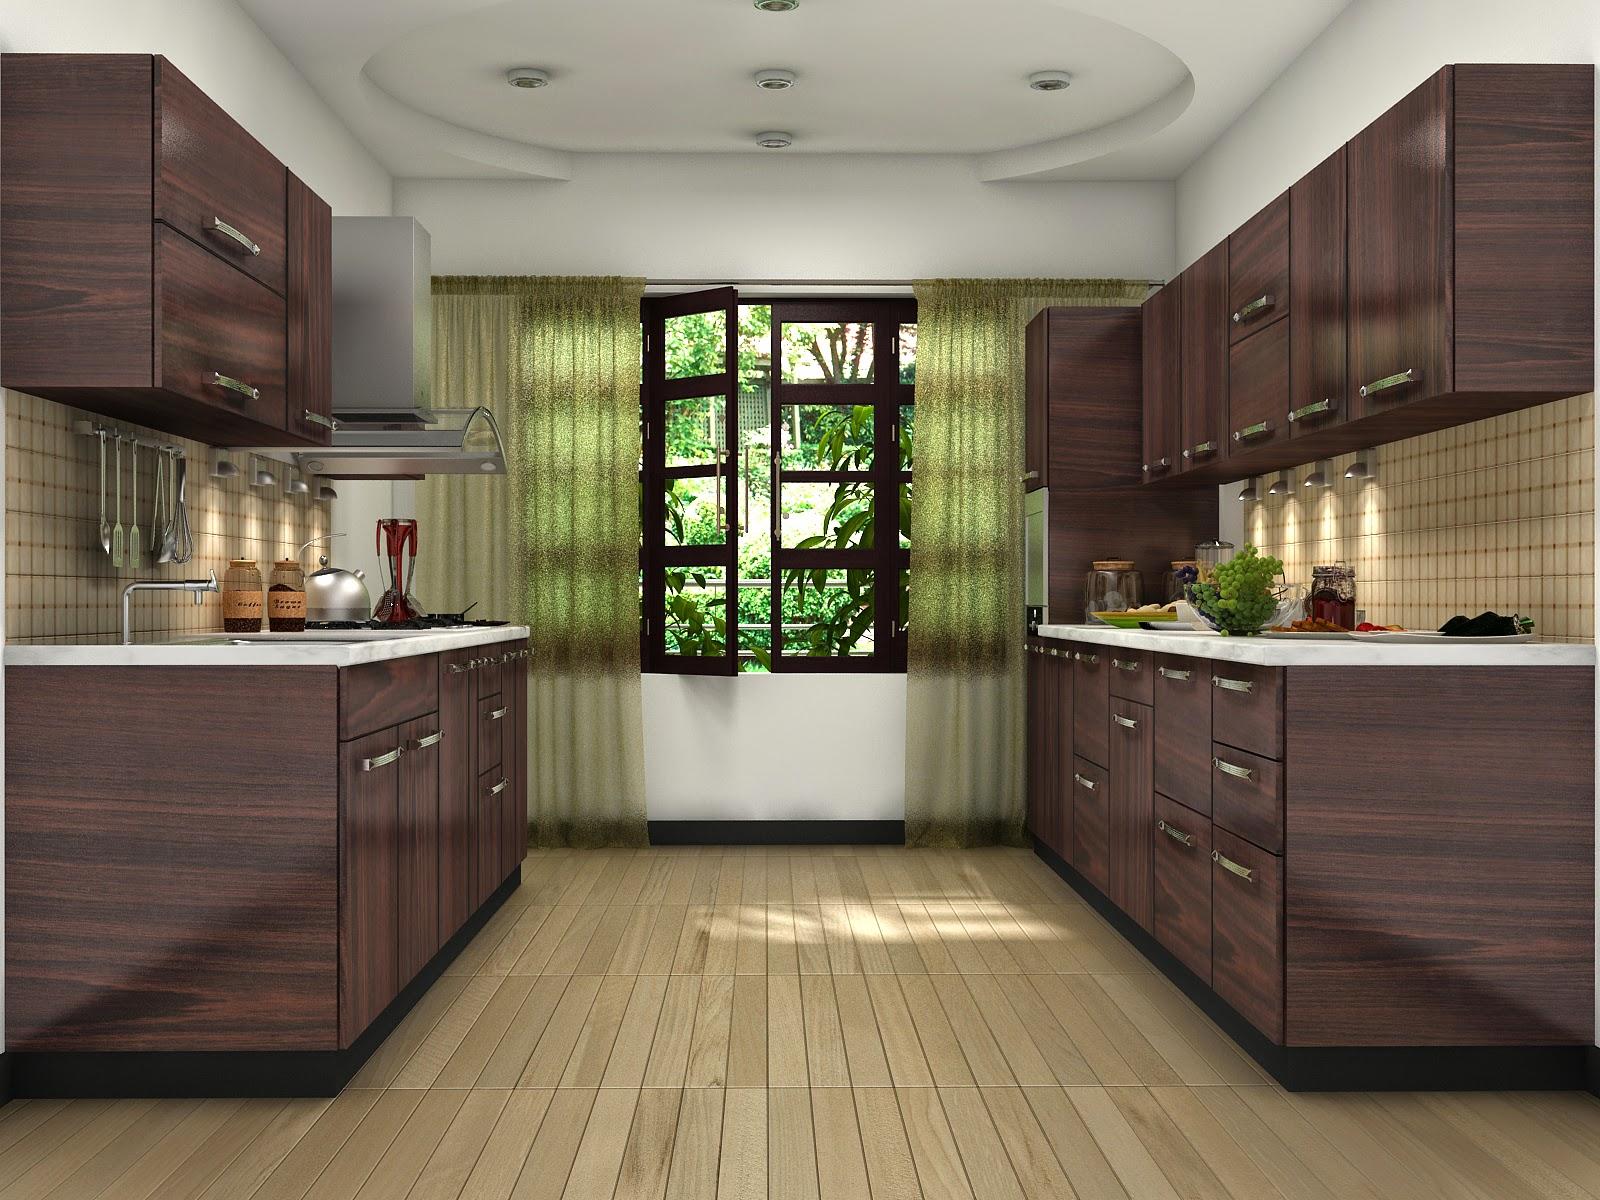 Modular Kitchens buying guide Interior Decor Blog